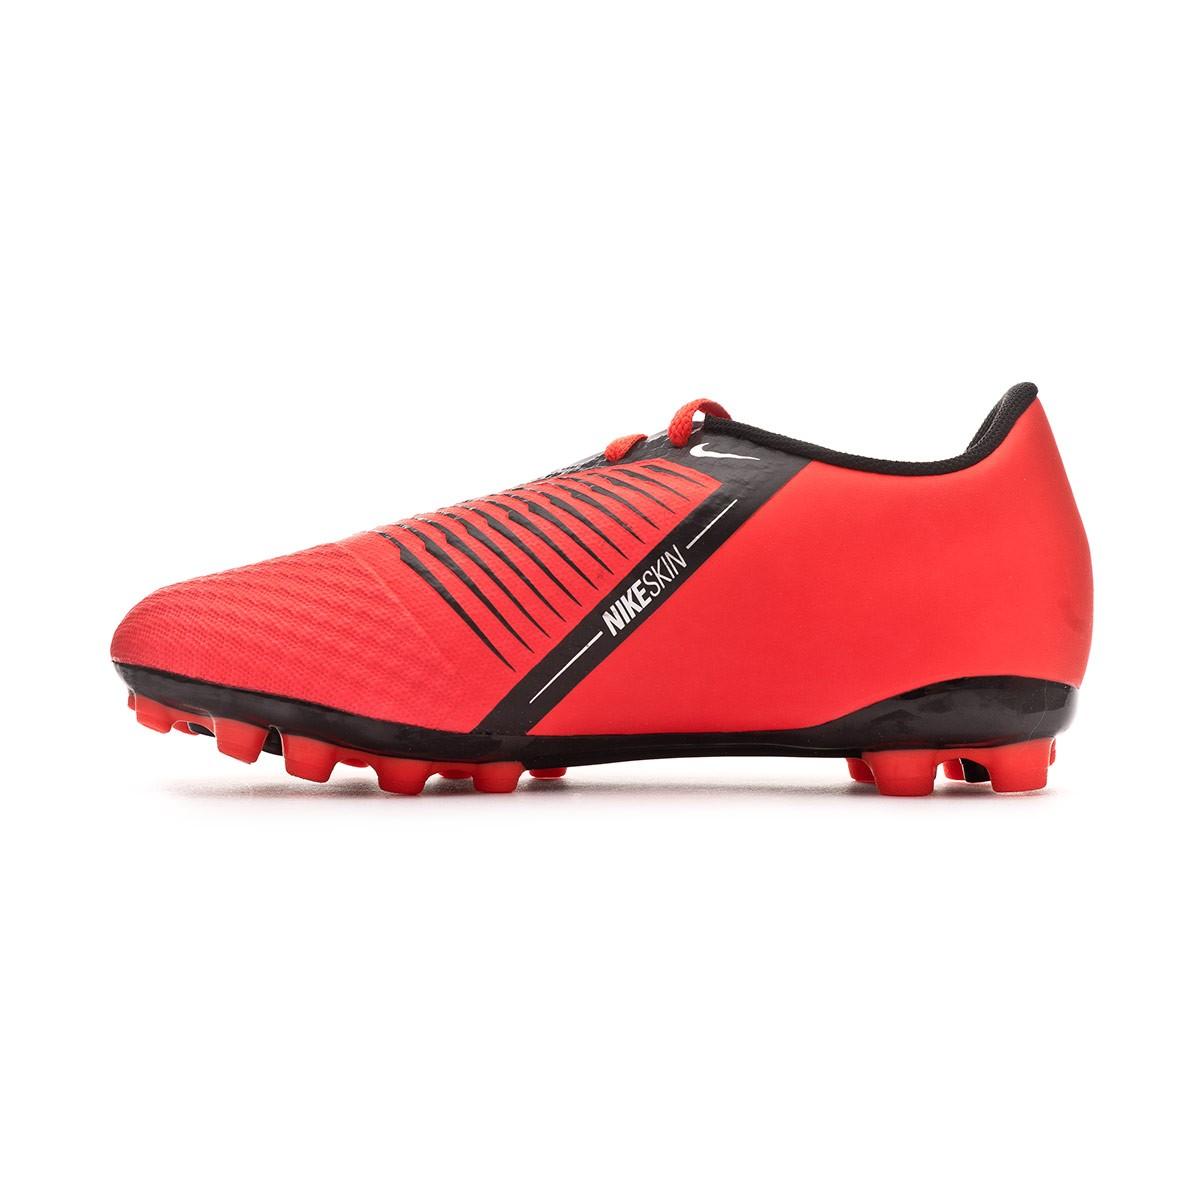 ddb85f76f Football Boots Nike Kids Phantom Venom Academy AG-R Bright crimson-Black -  Football store Fútbol Emotion